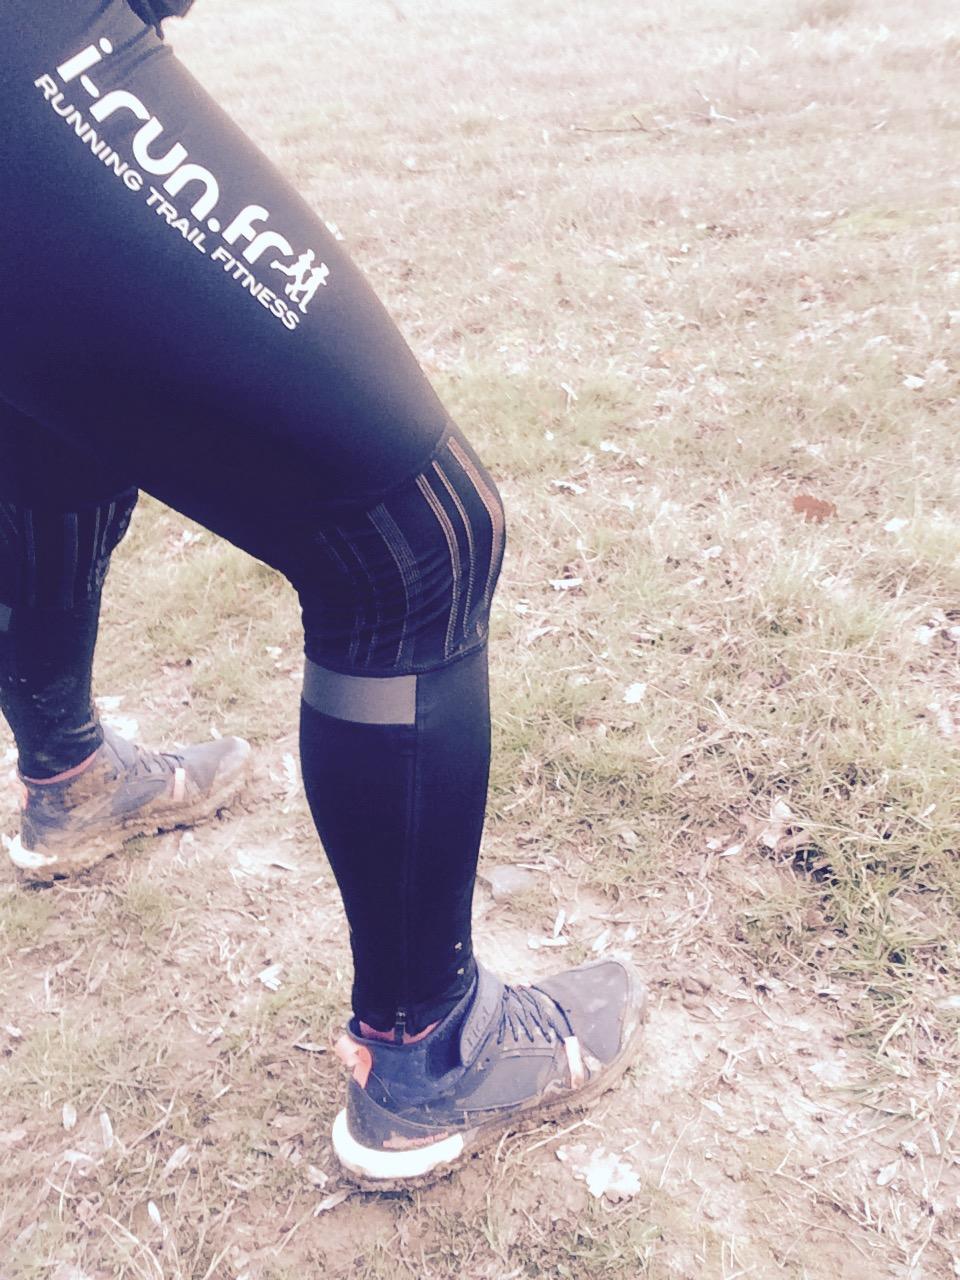 Test Adidas Supernova Riot 7 Homme 2016, avis chaussure